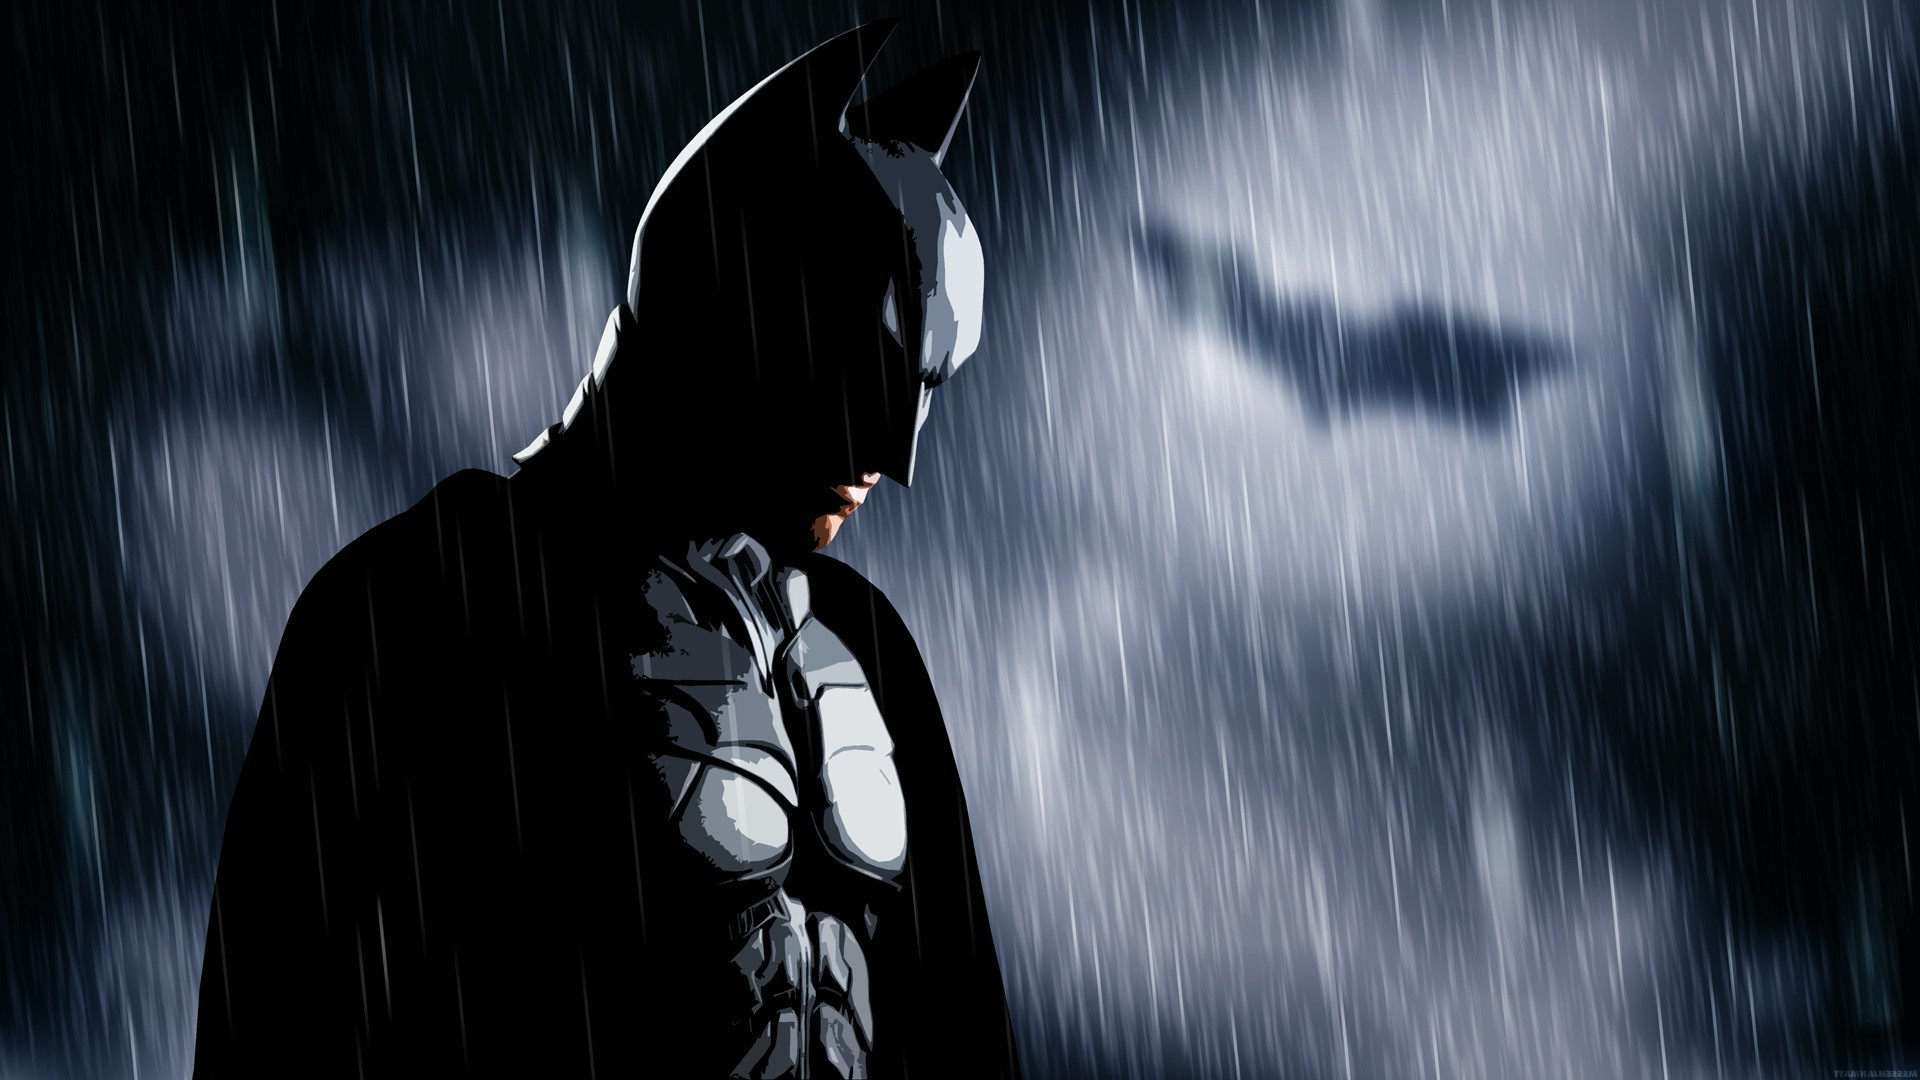 Batman, Bat Signal, Rain, MessenjahMatt, People Wallpapers HD / Desktop and  Mobile Backgrounds